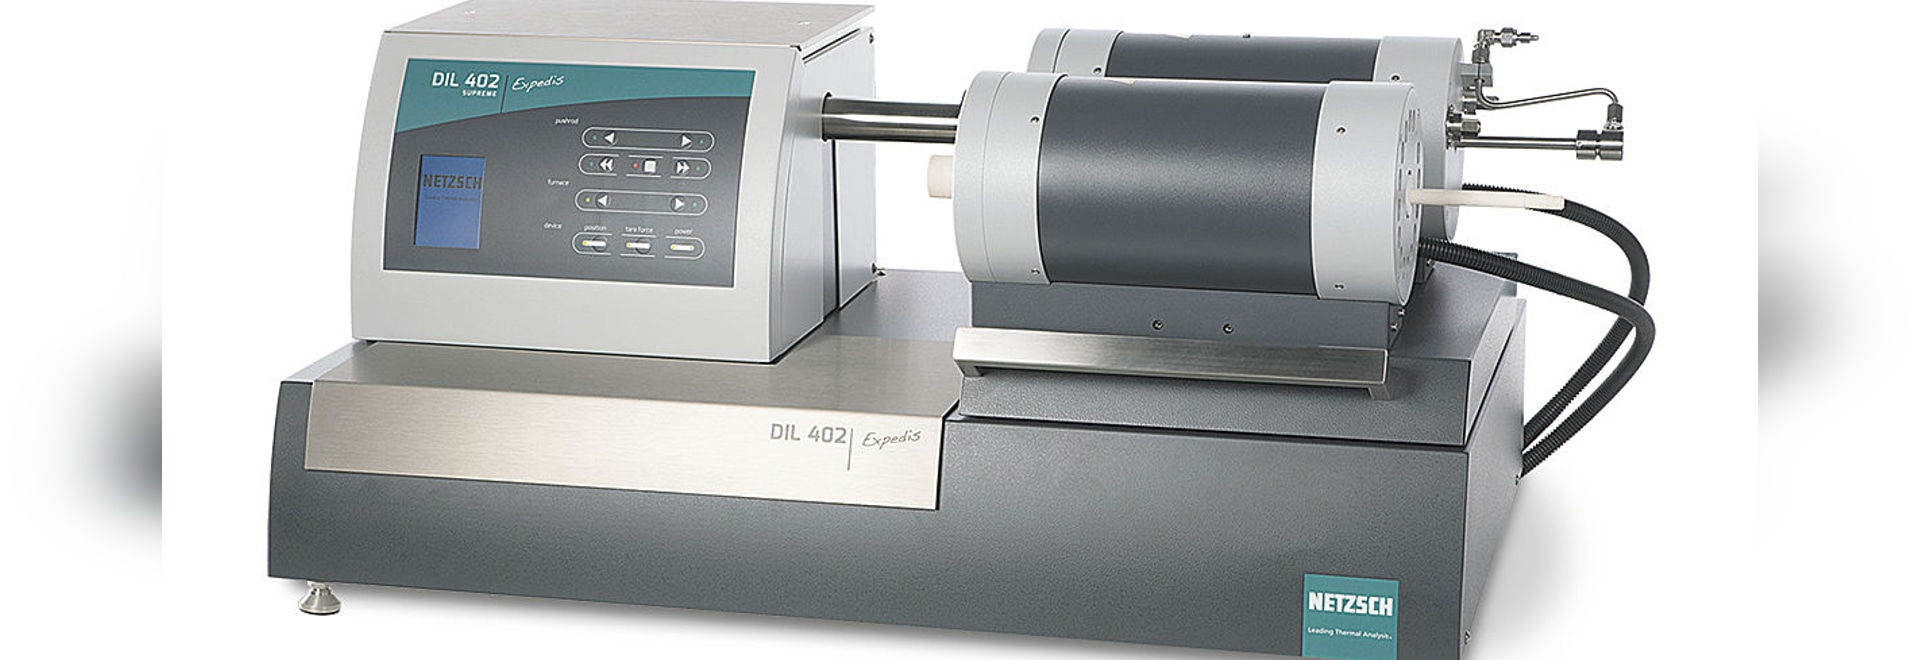 "The New ""NanoEye"" Measuring Cell: Revolutionizing Dilatometry"